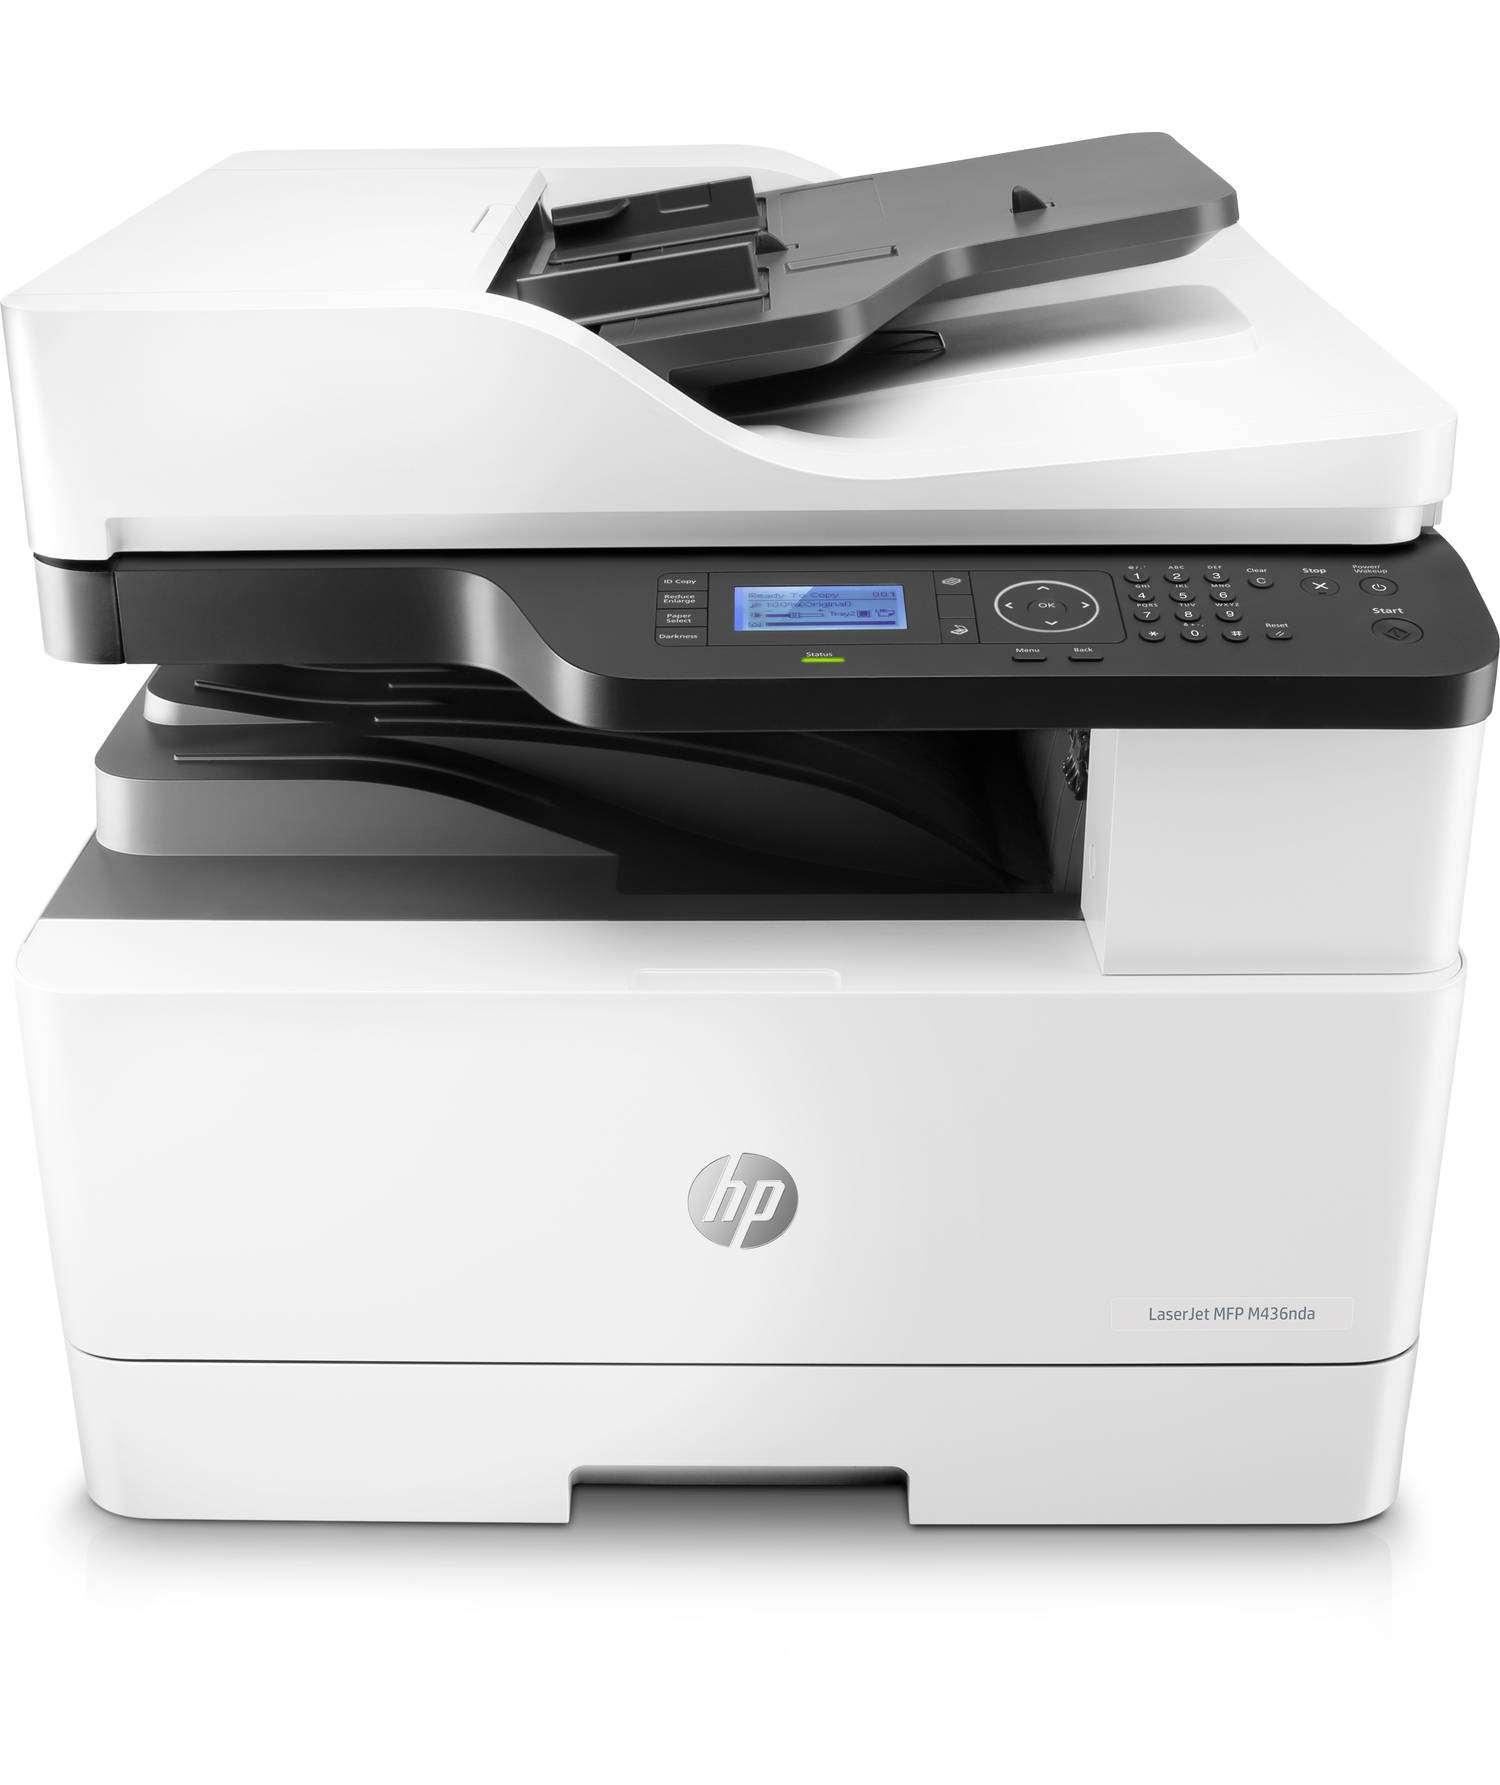 HP LaserJet MFP M436nda (A3, 23/12 ppm A4/A3, USB, Ethernet, Print/Scan/Copy, Duplex, ADF) (W7U02A#B19)